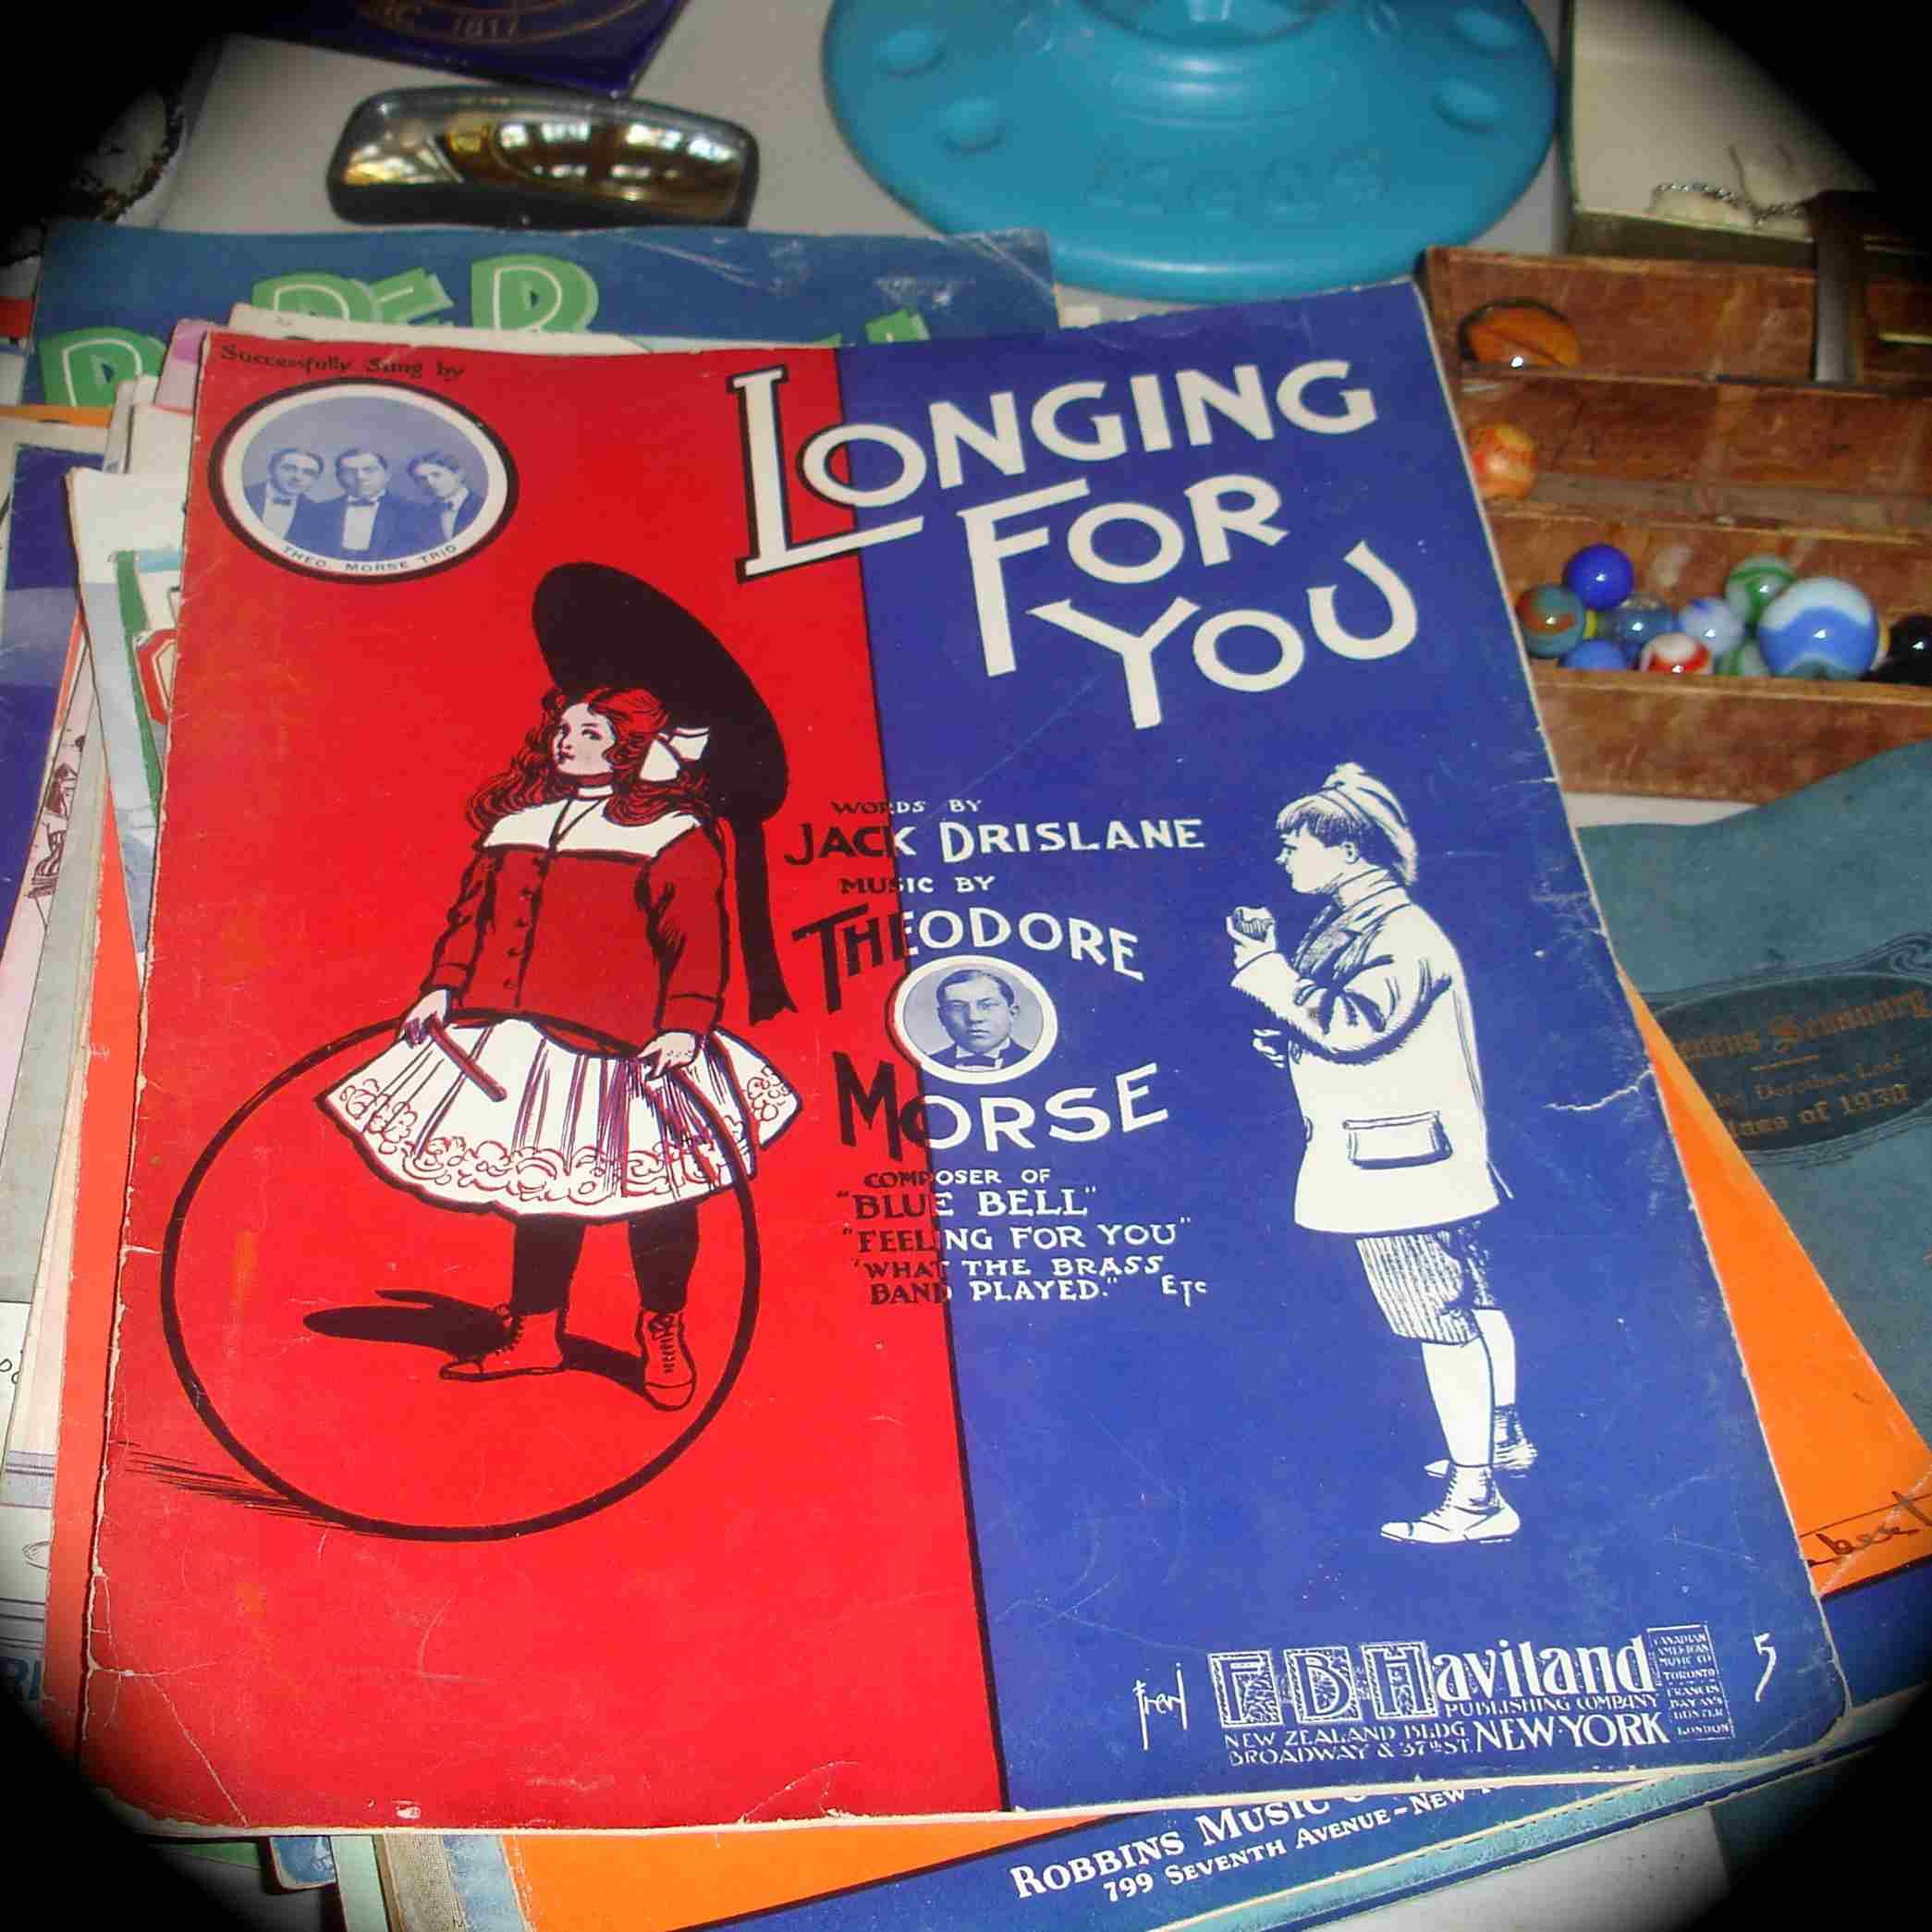 Vintage music score found at Brooklyn Flea.